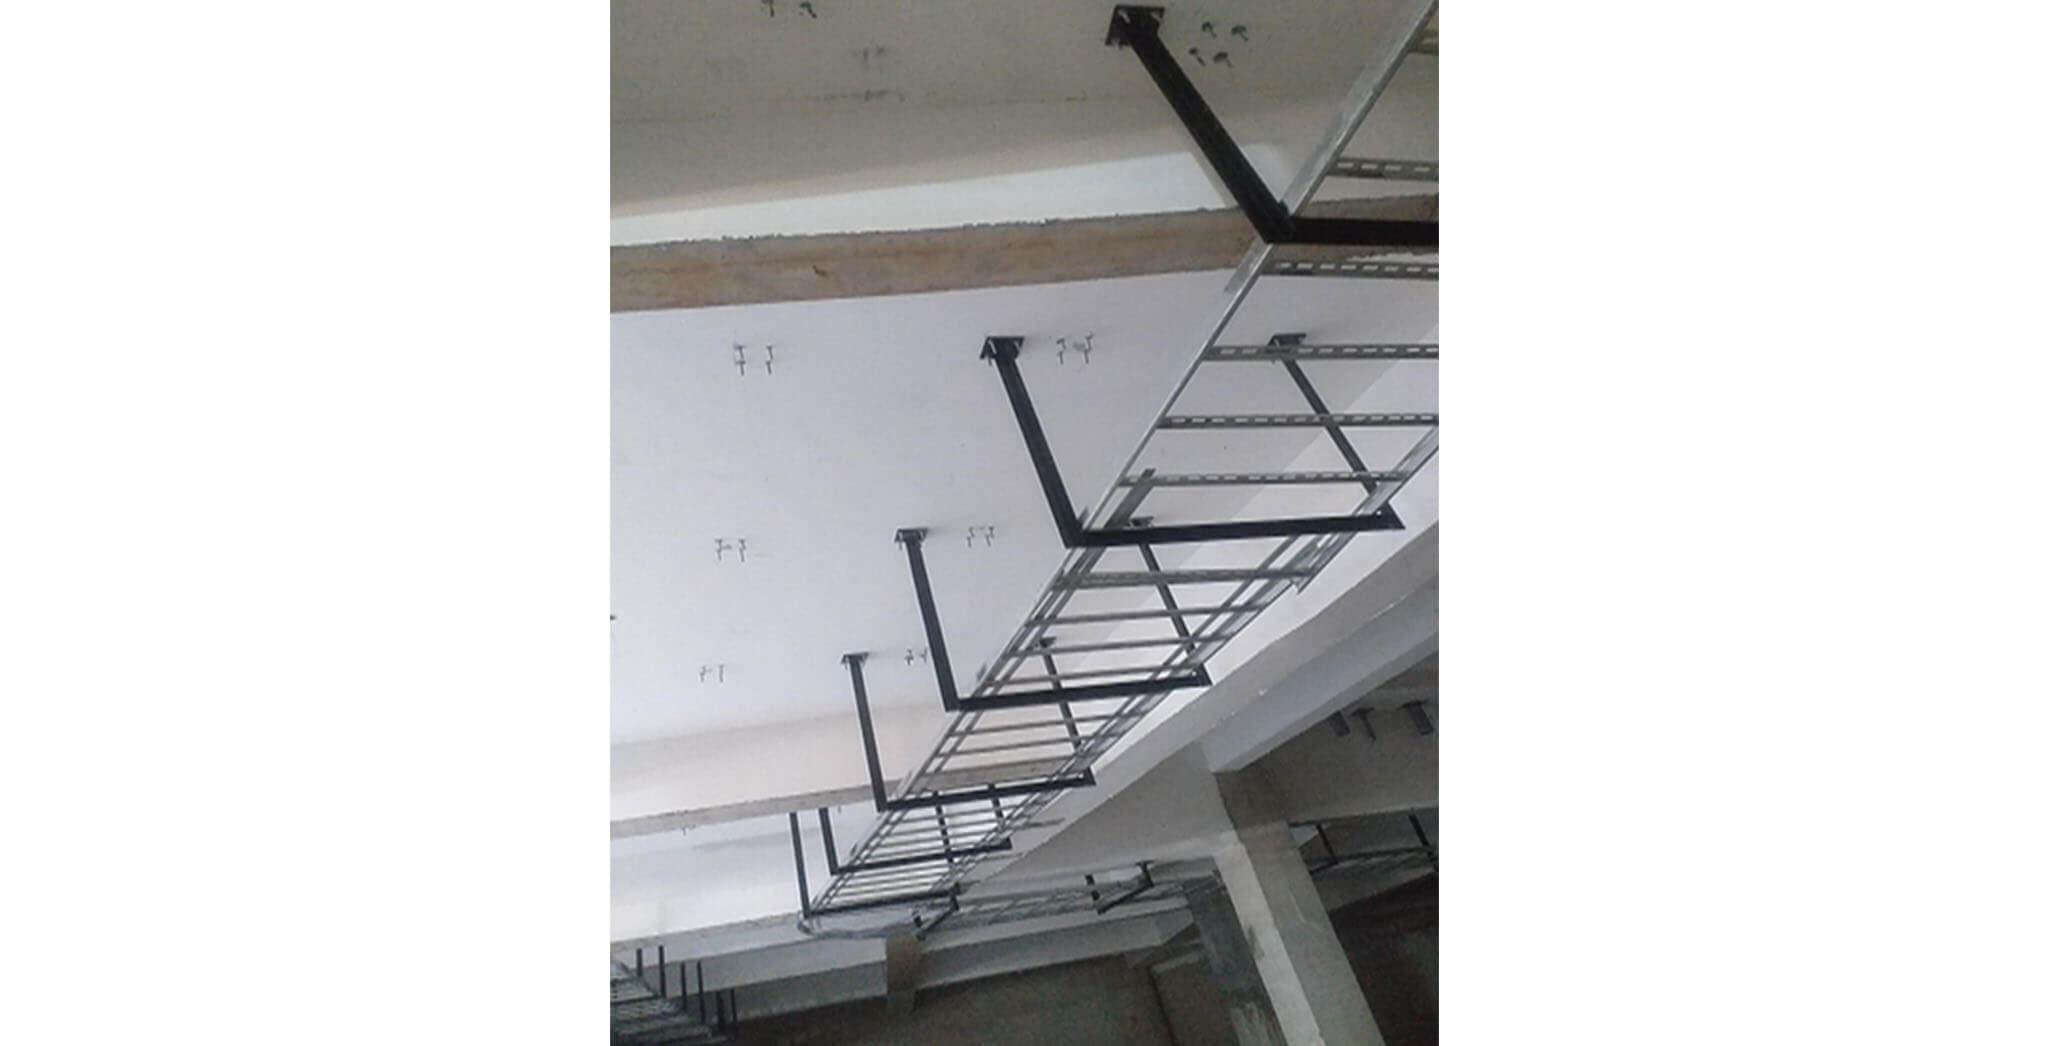 Feb 2021 - Basement ceiling view: Cable tray in progress at J, K, L, M, N & P blocks